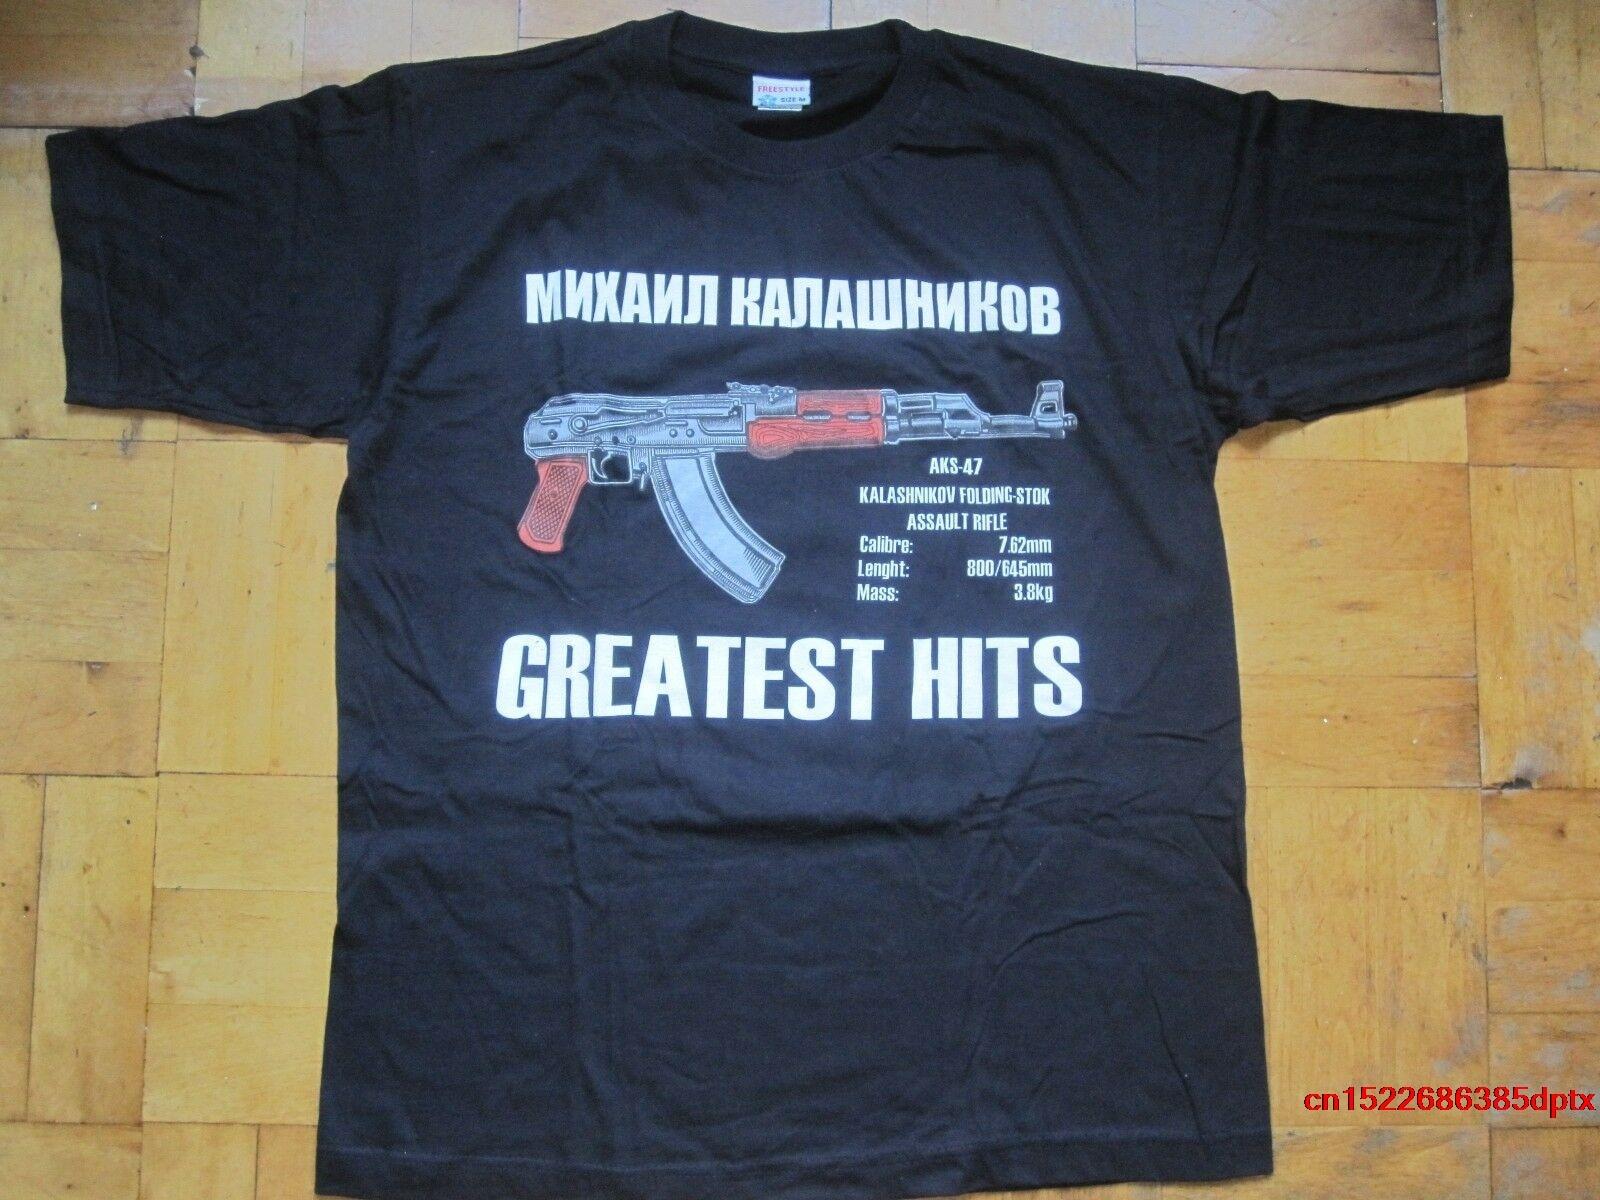 Camiseta de arma rusa AK-47 KALASHNIKOV riffle negro Rusia USSR ejército CCCP camiseta de hombre Russia cccp